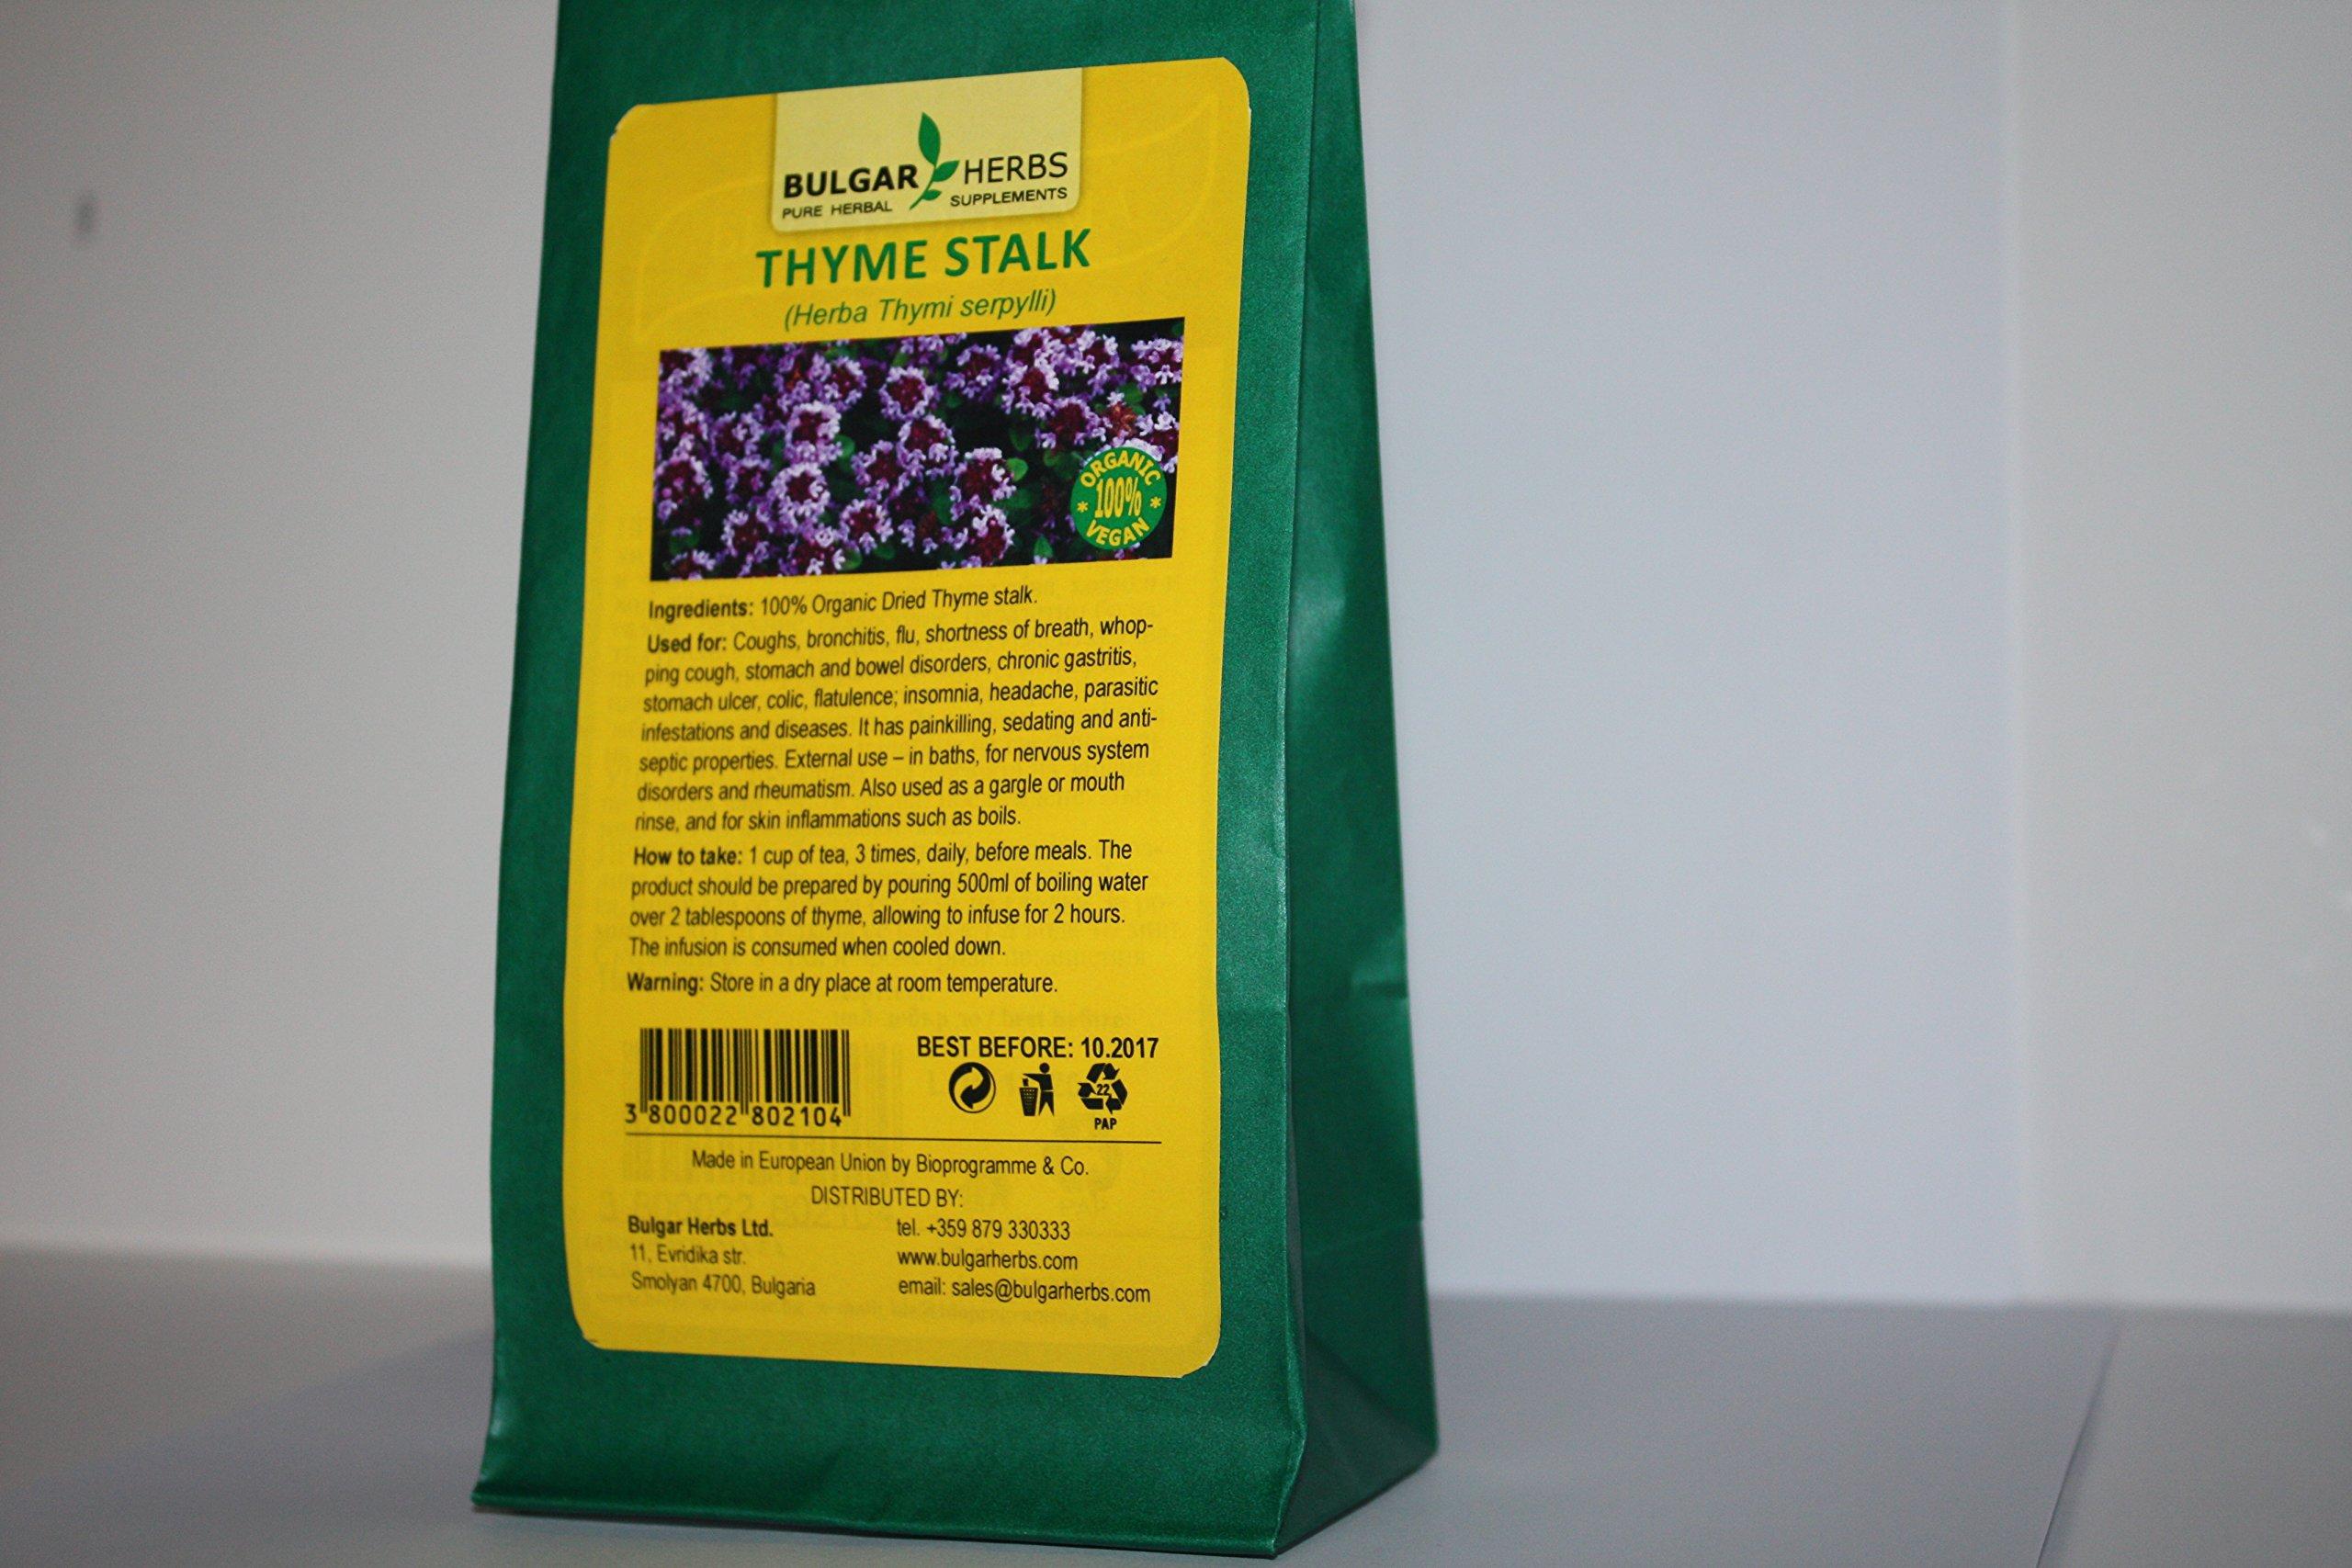 Organic Dried Thyme Stalk (Herba Thymi Serpylli) 2.5 Oz.